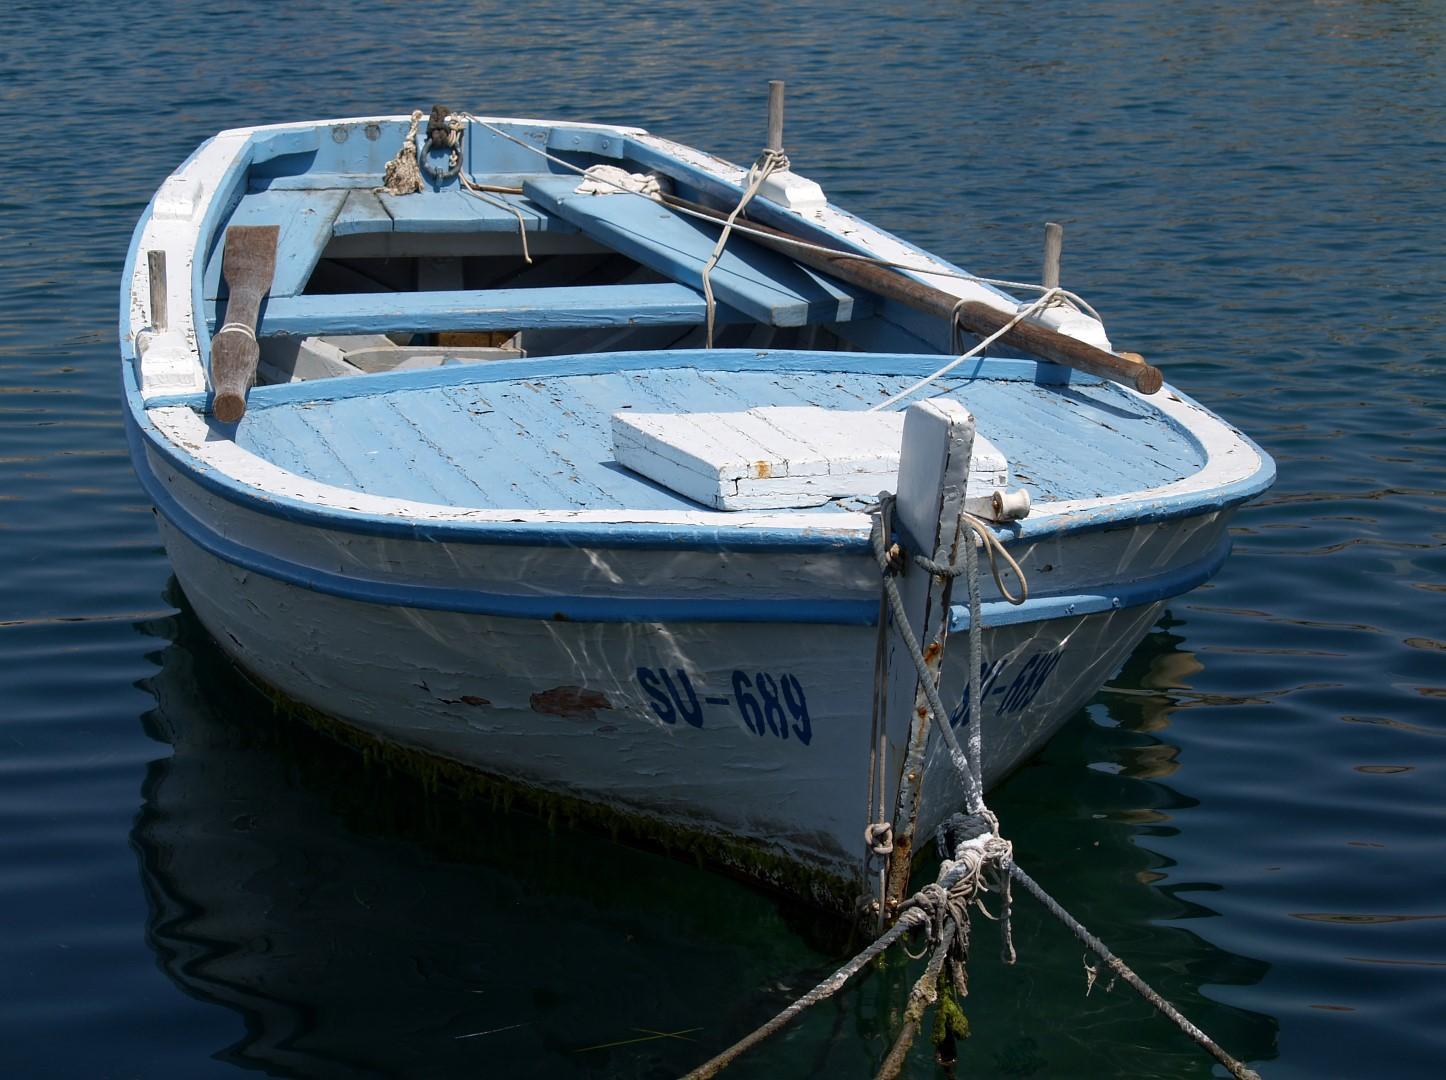 Guc boat